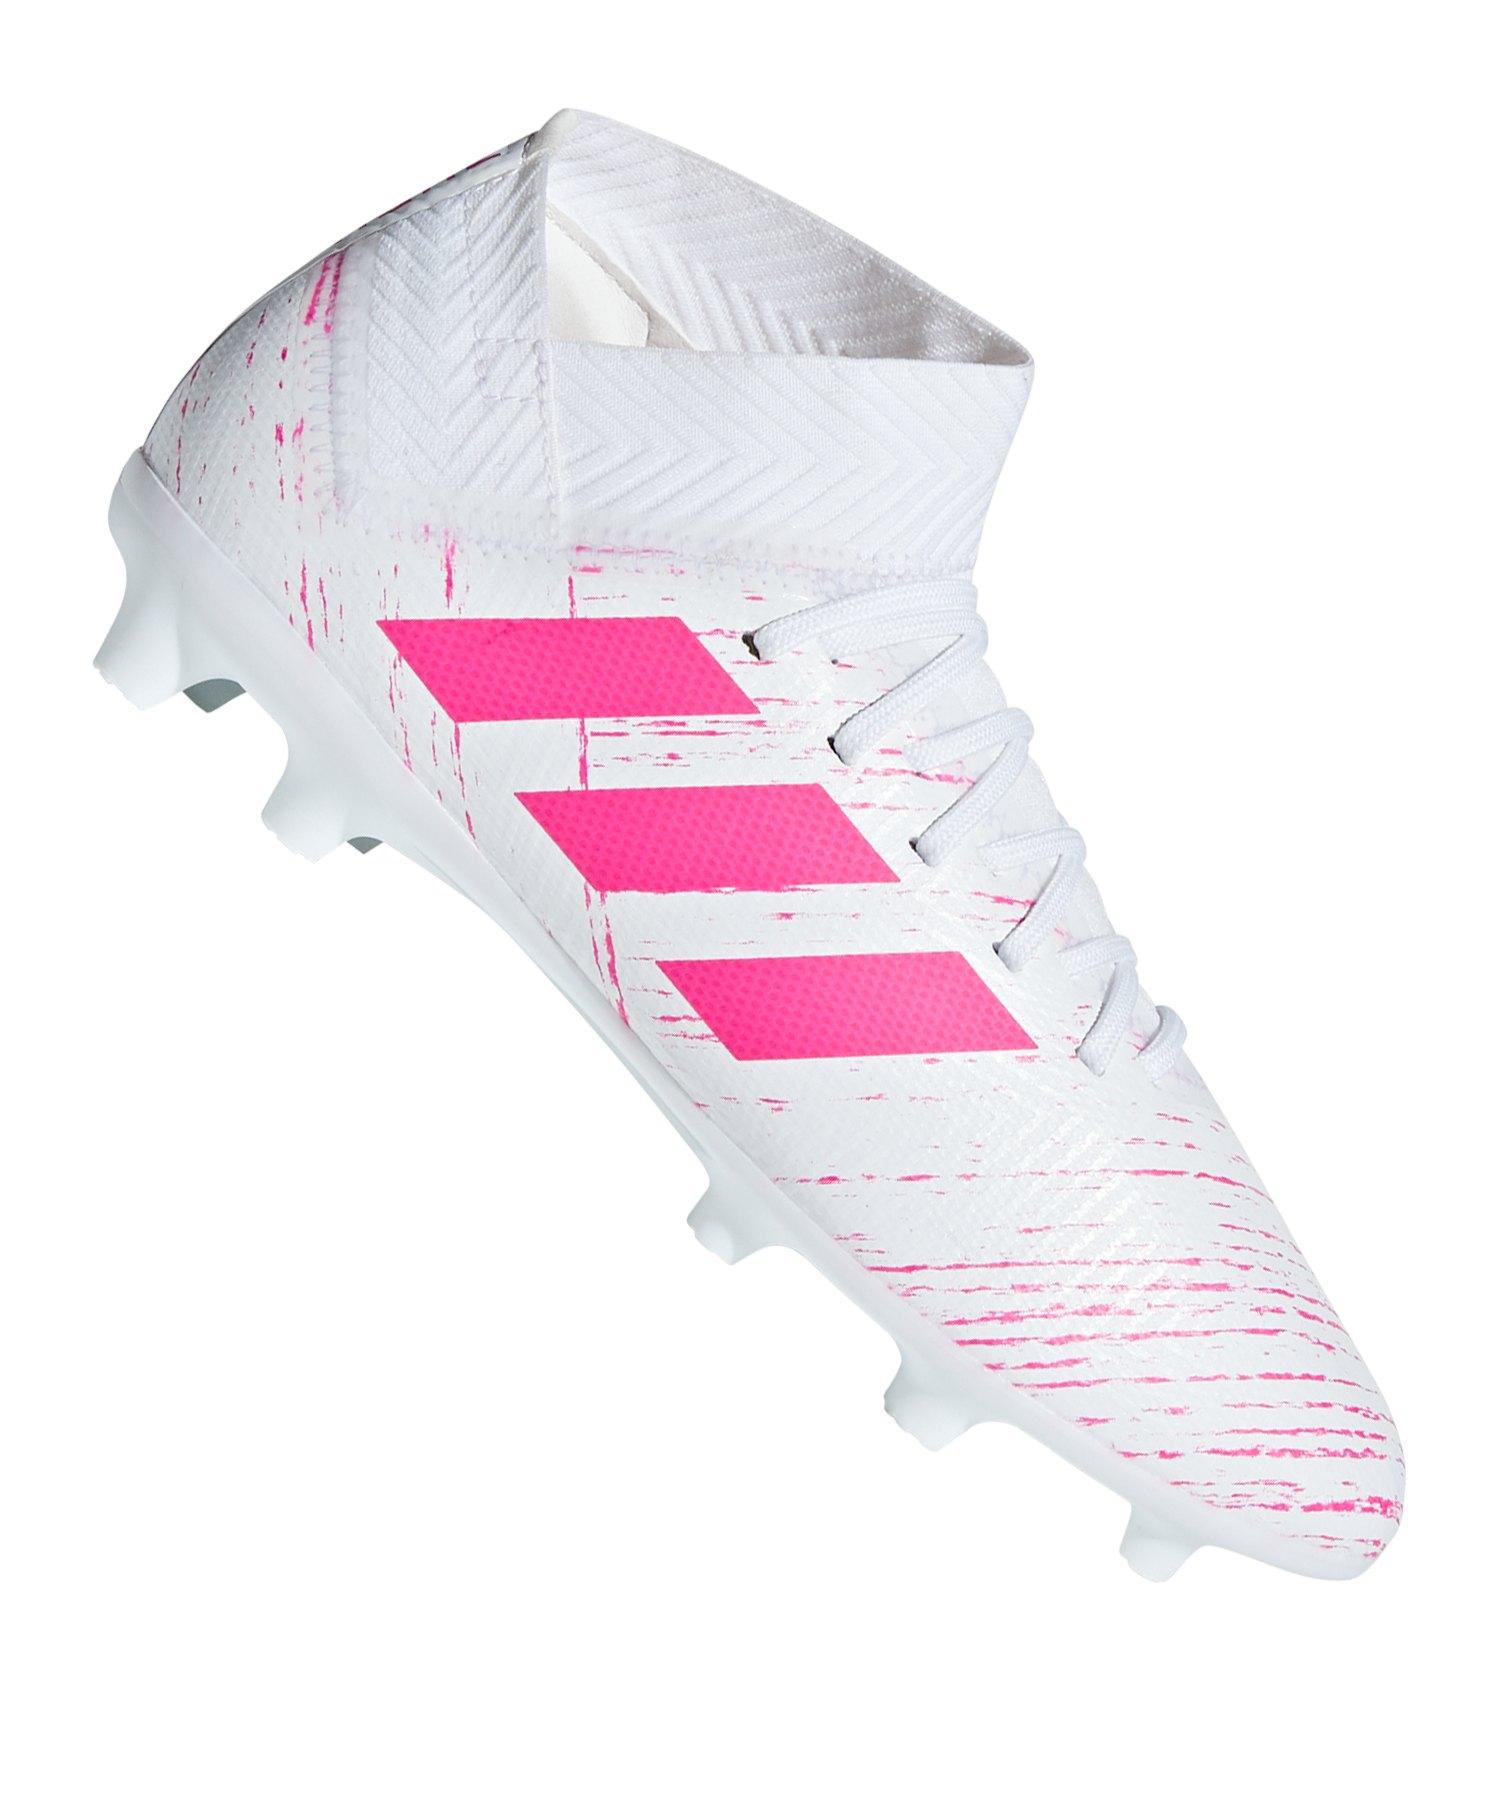 adidas NEMEZIZ 18.3 FG J Kids Weiss Pink